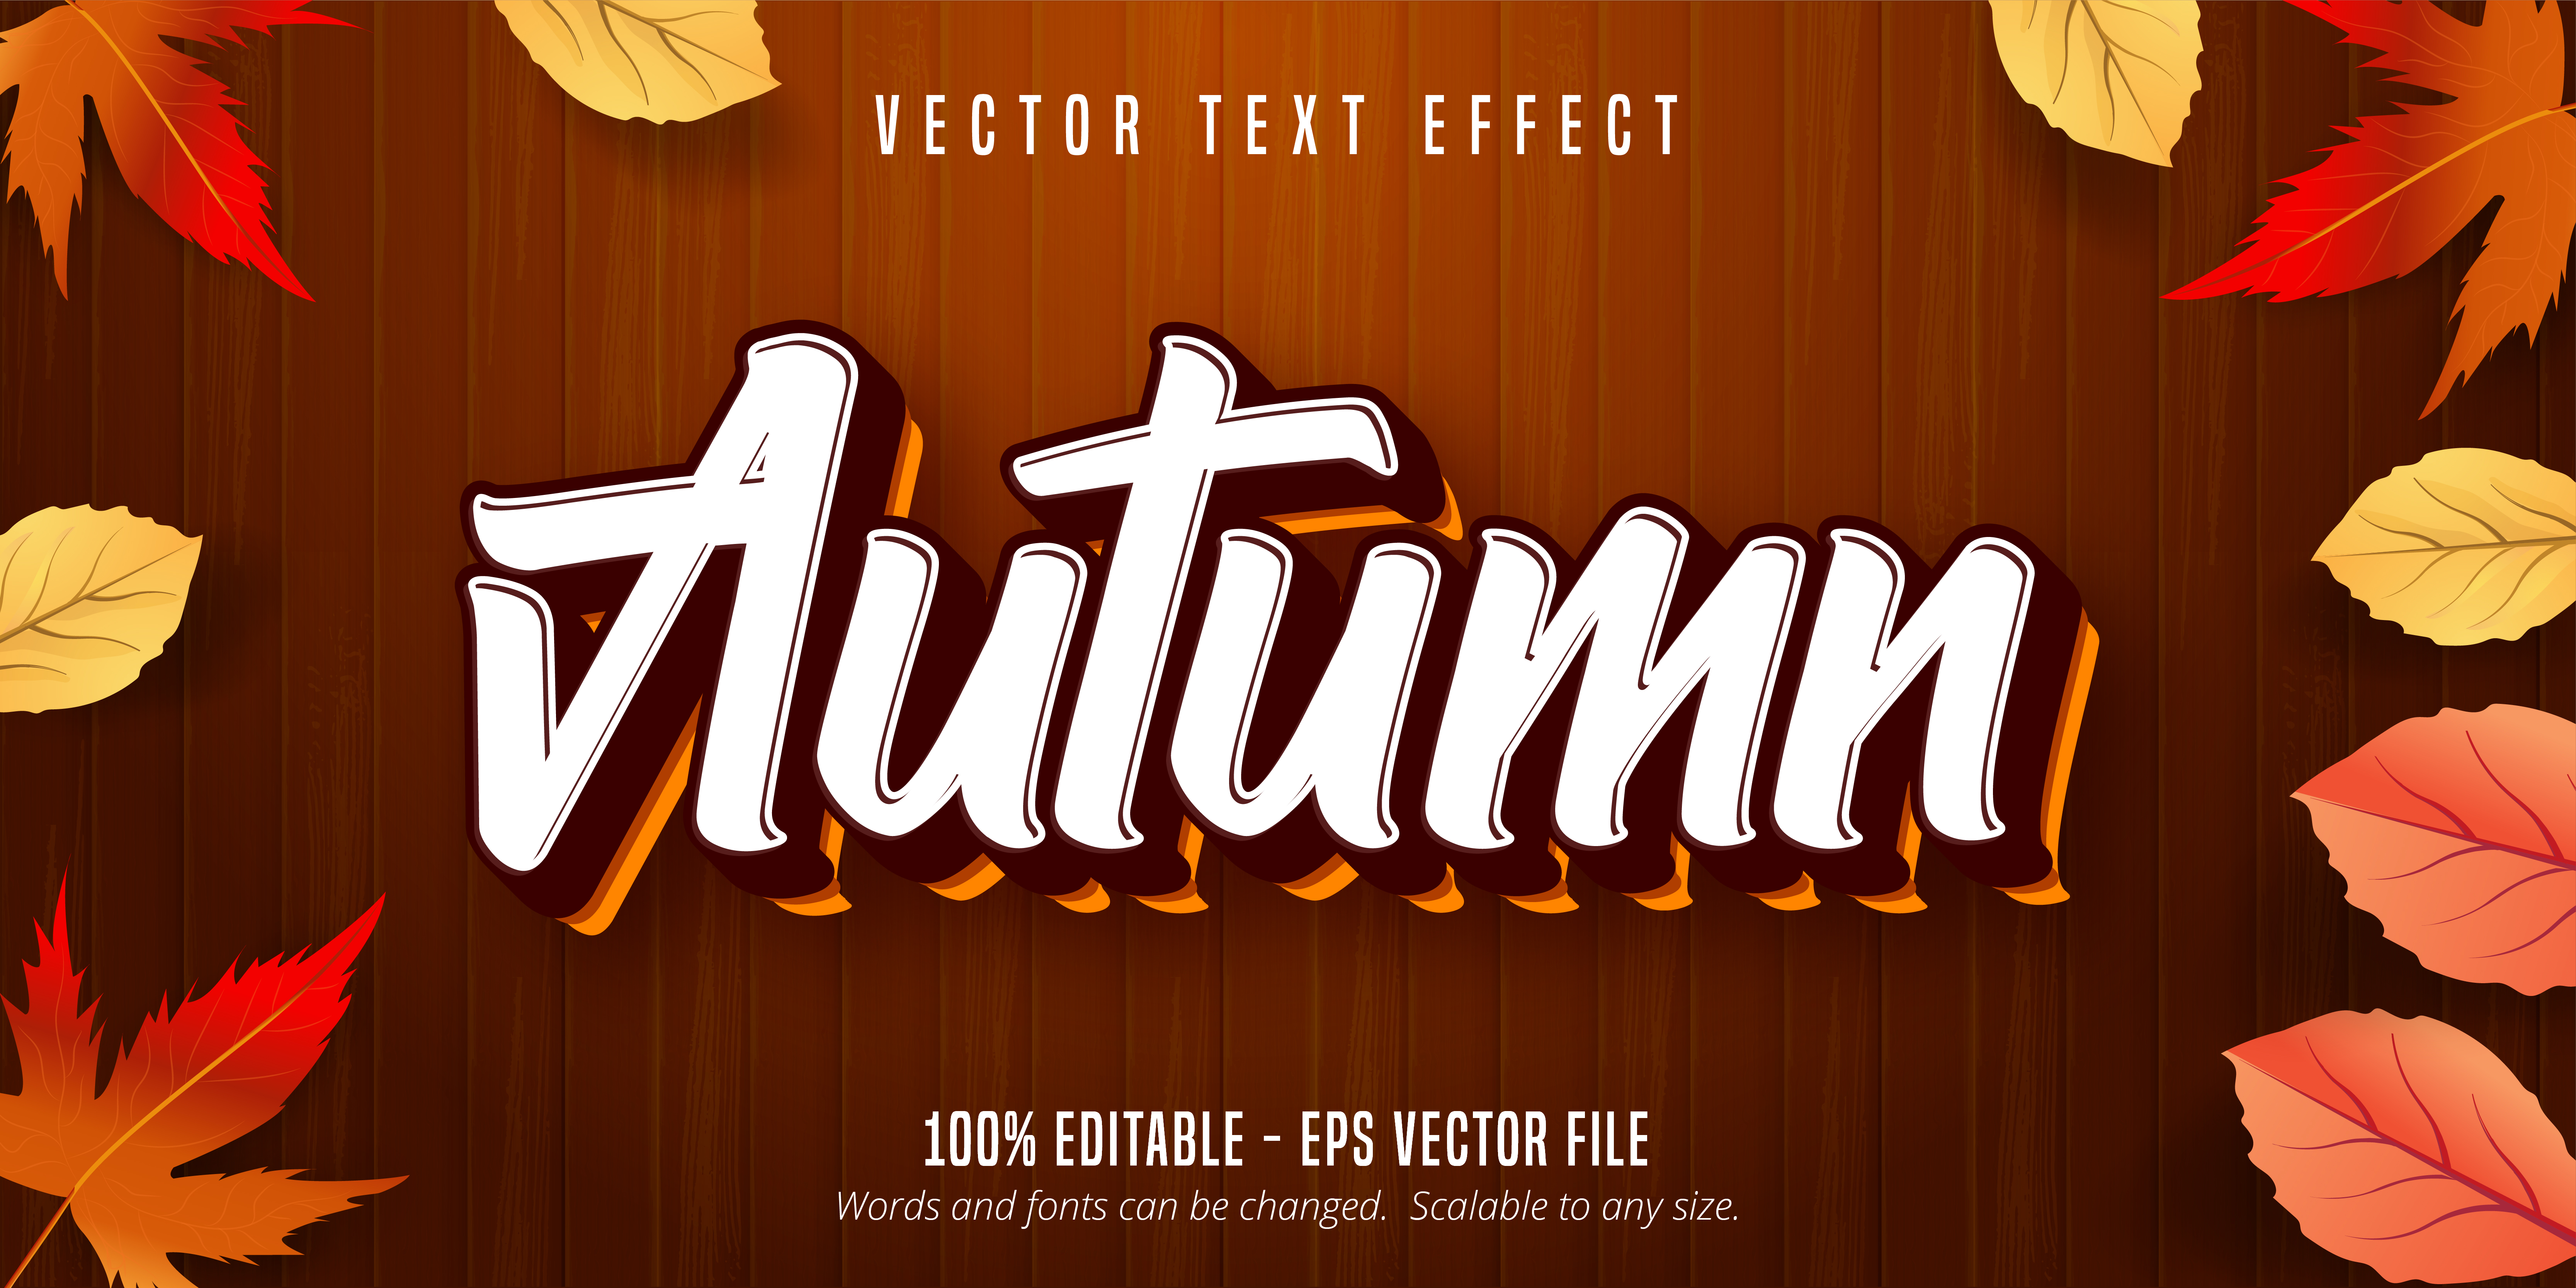 Autumn Style Text Effect on Wooden Texture